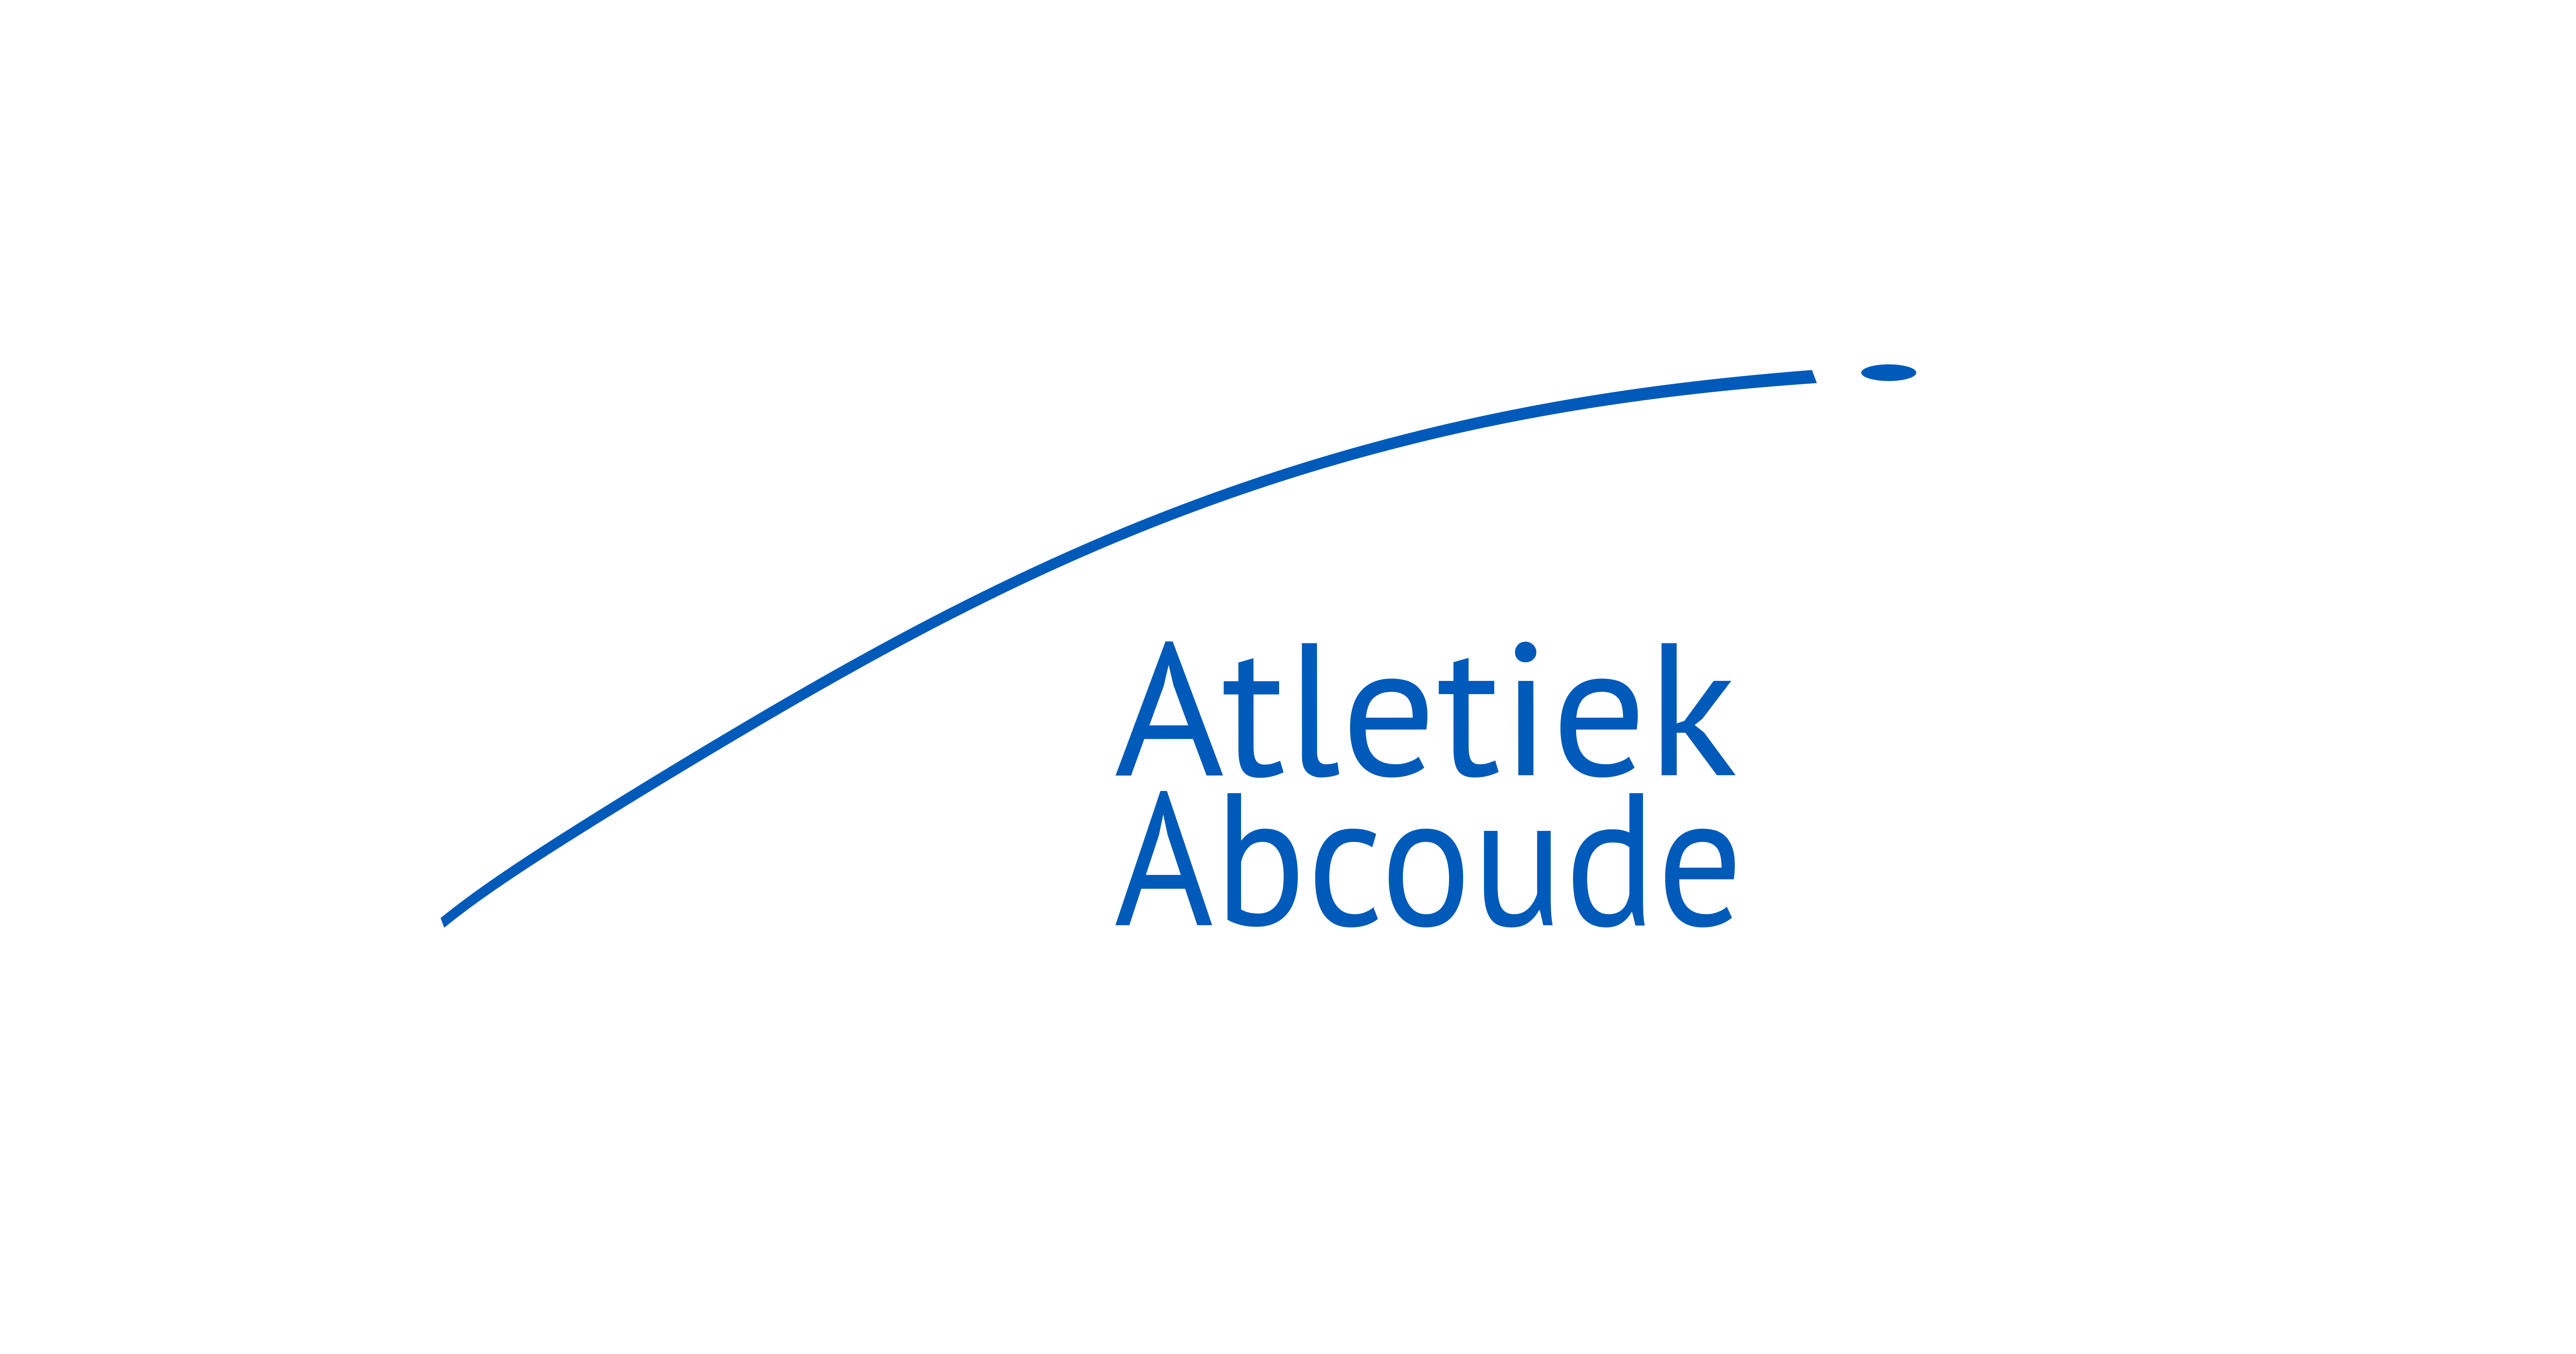 Logo Atletiek Abcoude